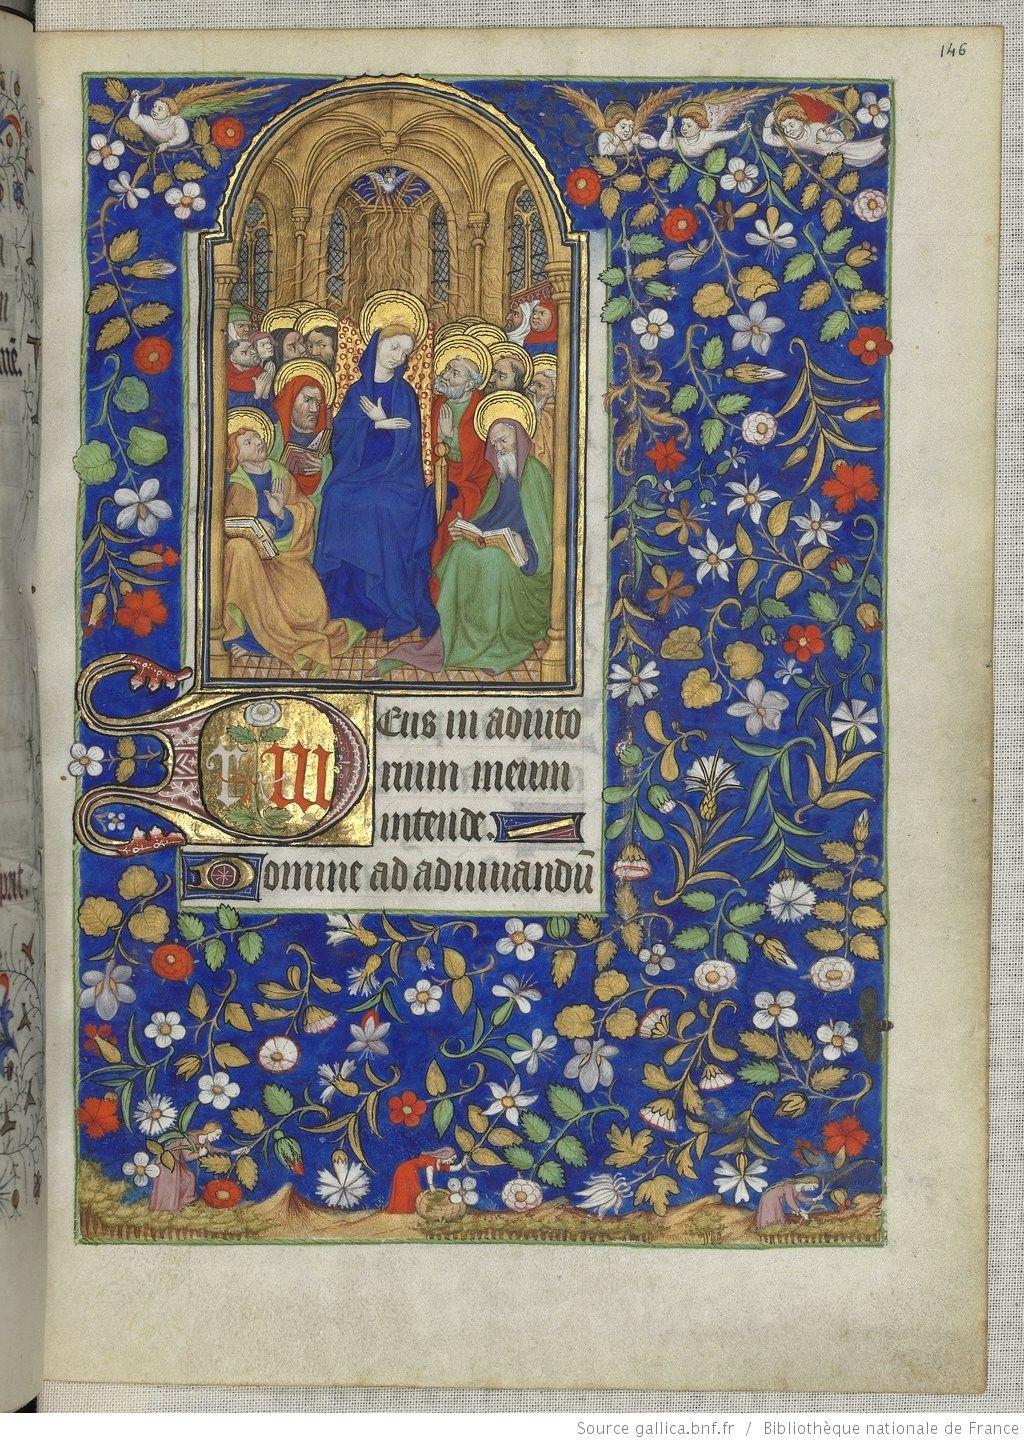 Horae ad usum romanum. | Gallica. Heures de Marguerite d'Orléans